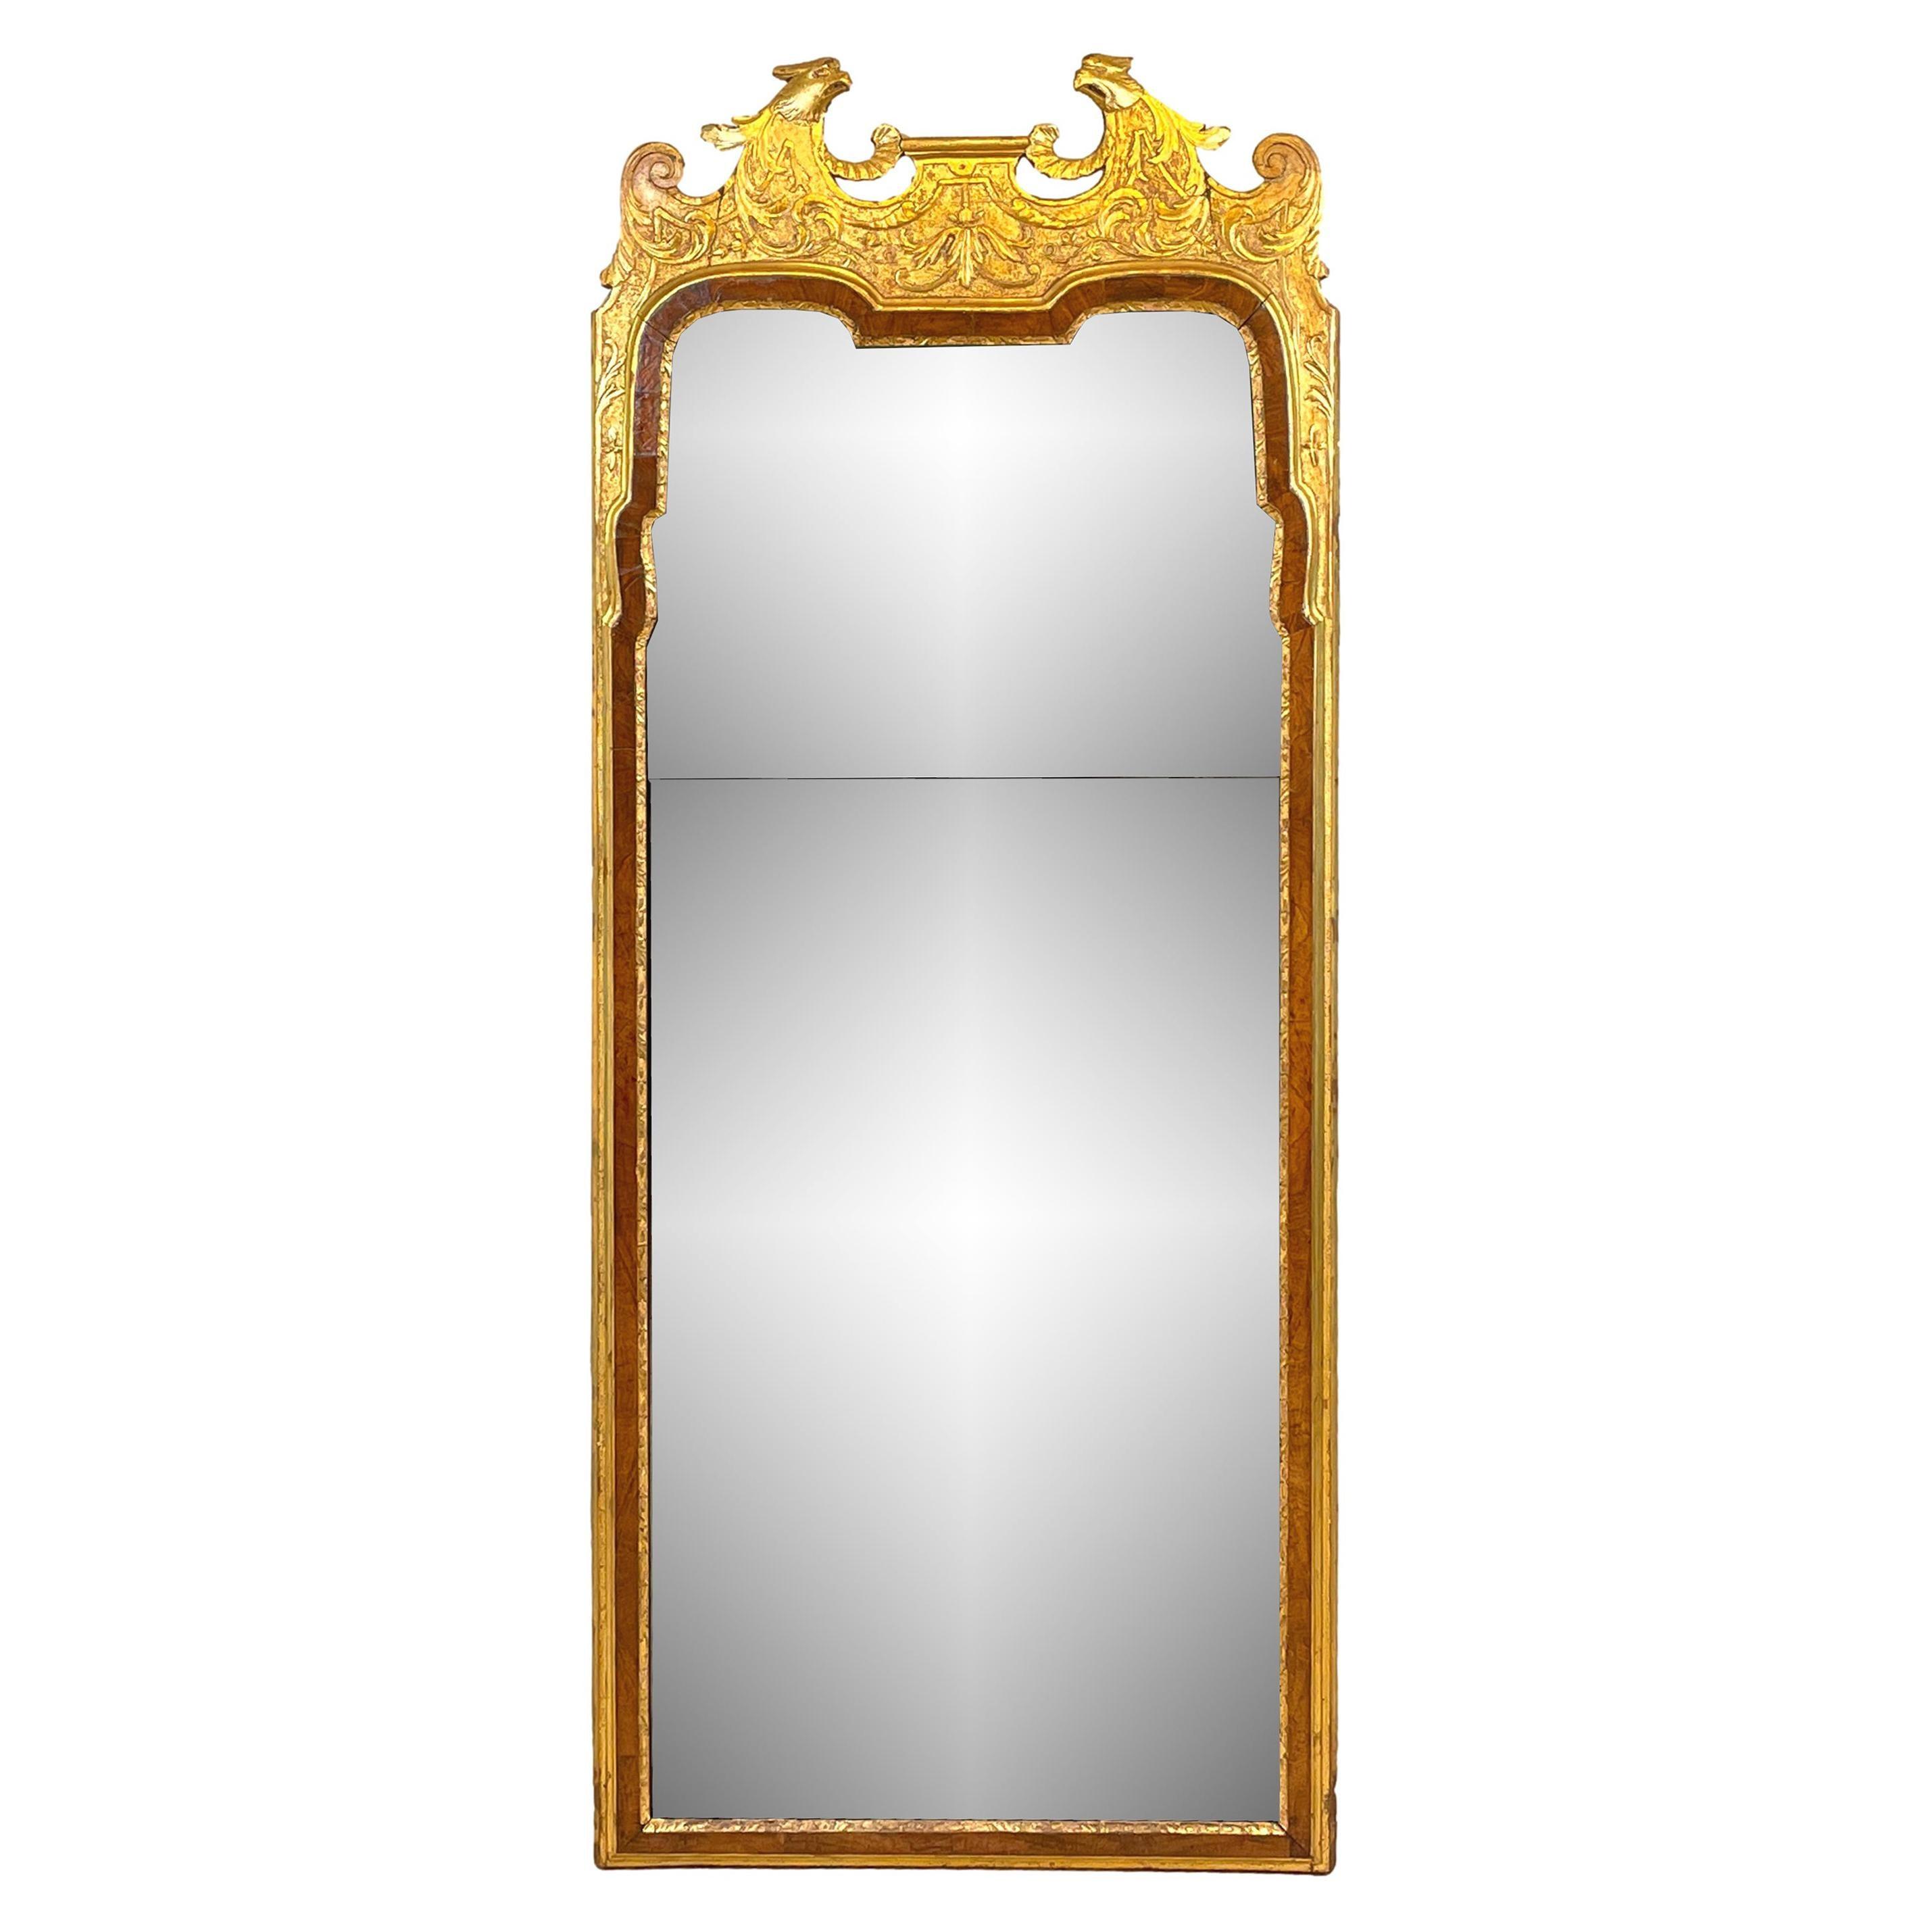 Rare Early Georgian 18th Century Walnut & Gilt Pier Mirror